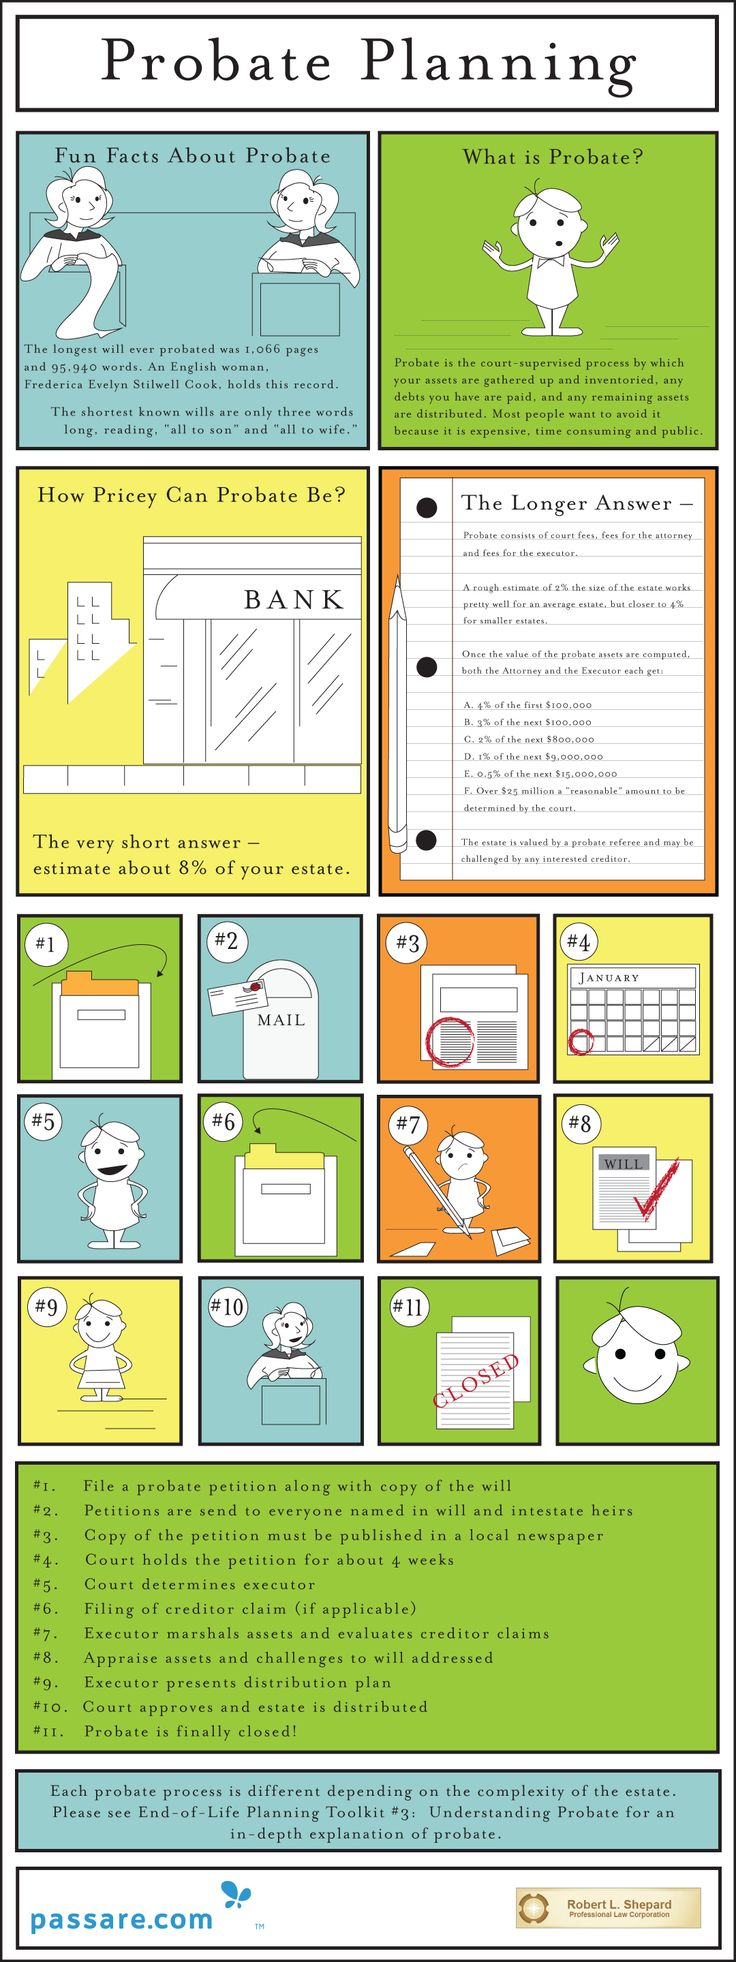 Understanding Probate Probate Planning - #Infographic via @Passare.com™